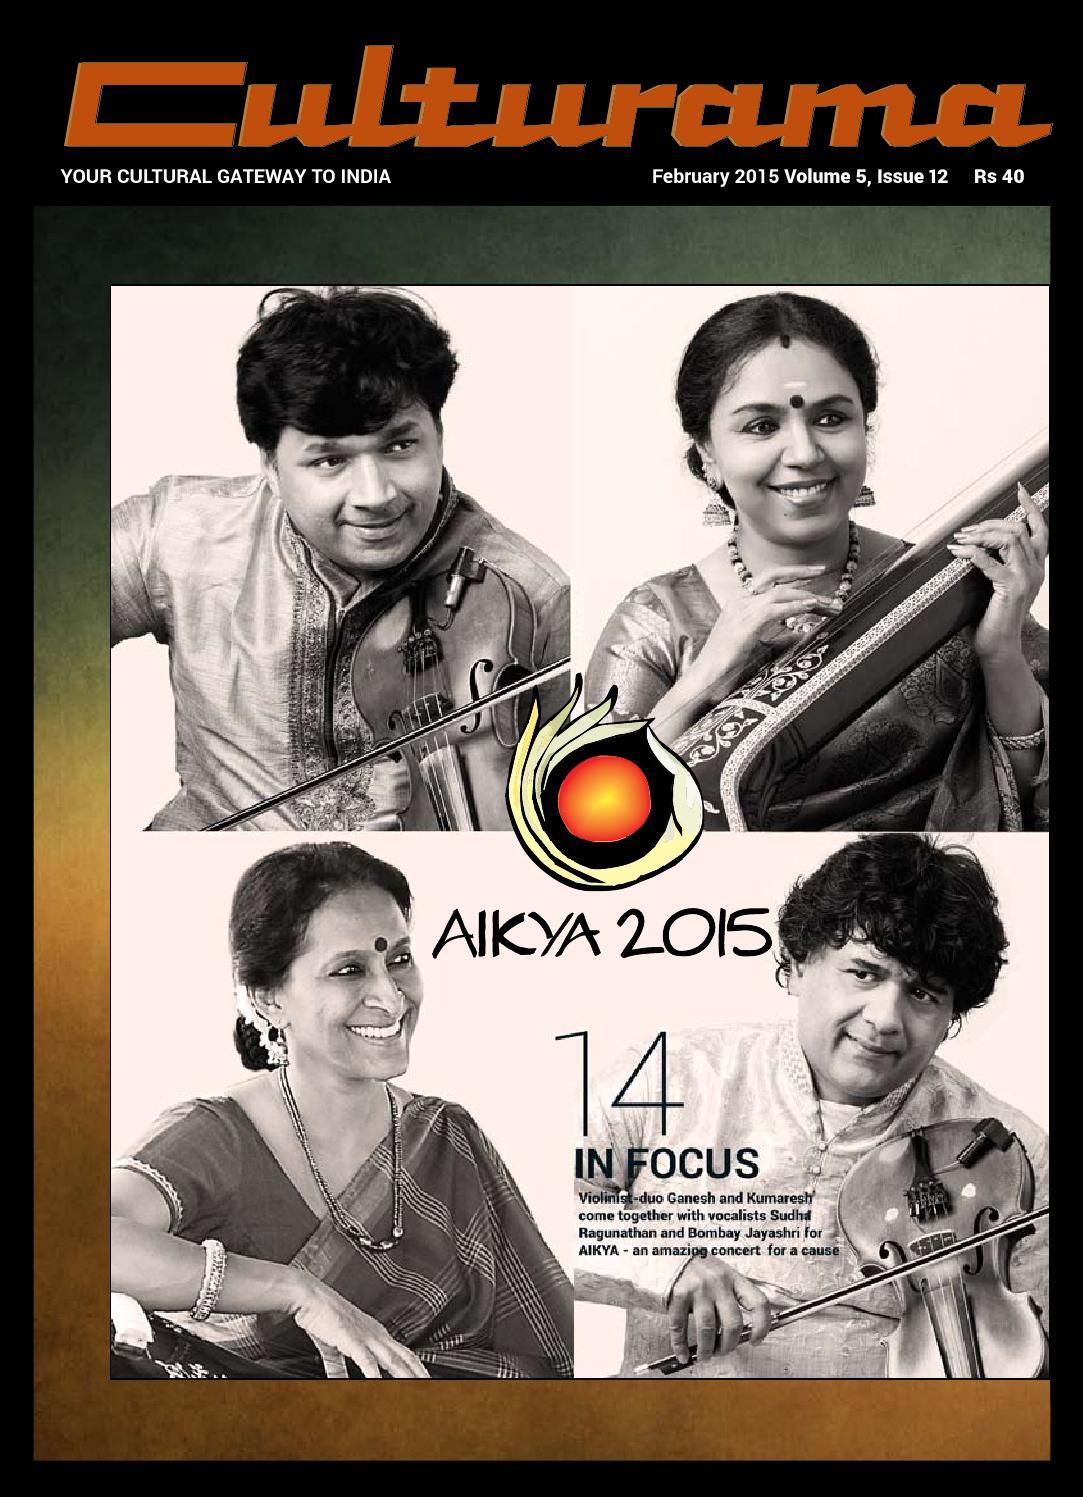 Pc sorcar magic show in bangalore dating